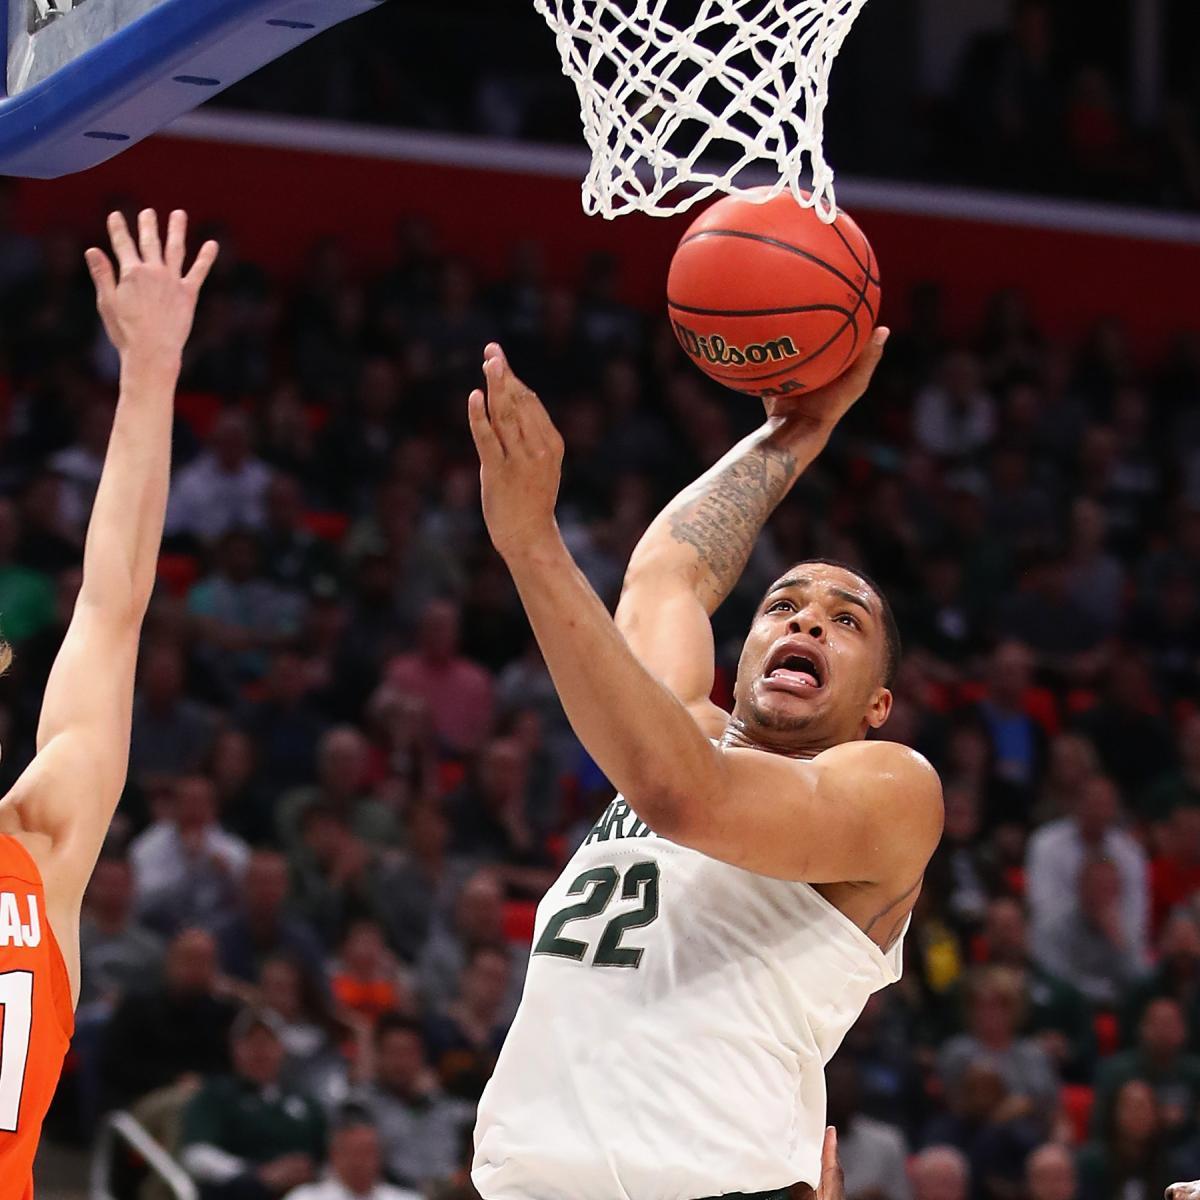 Miles Bridges NBA Draft 2018: Scouting Report, Grade For